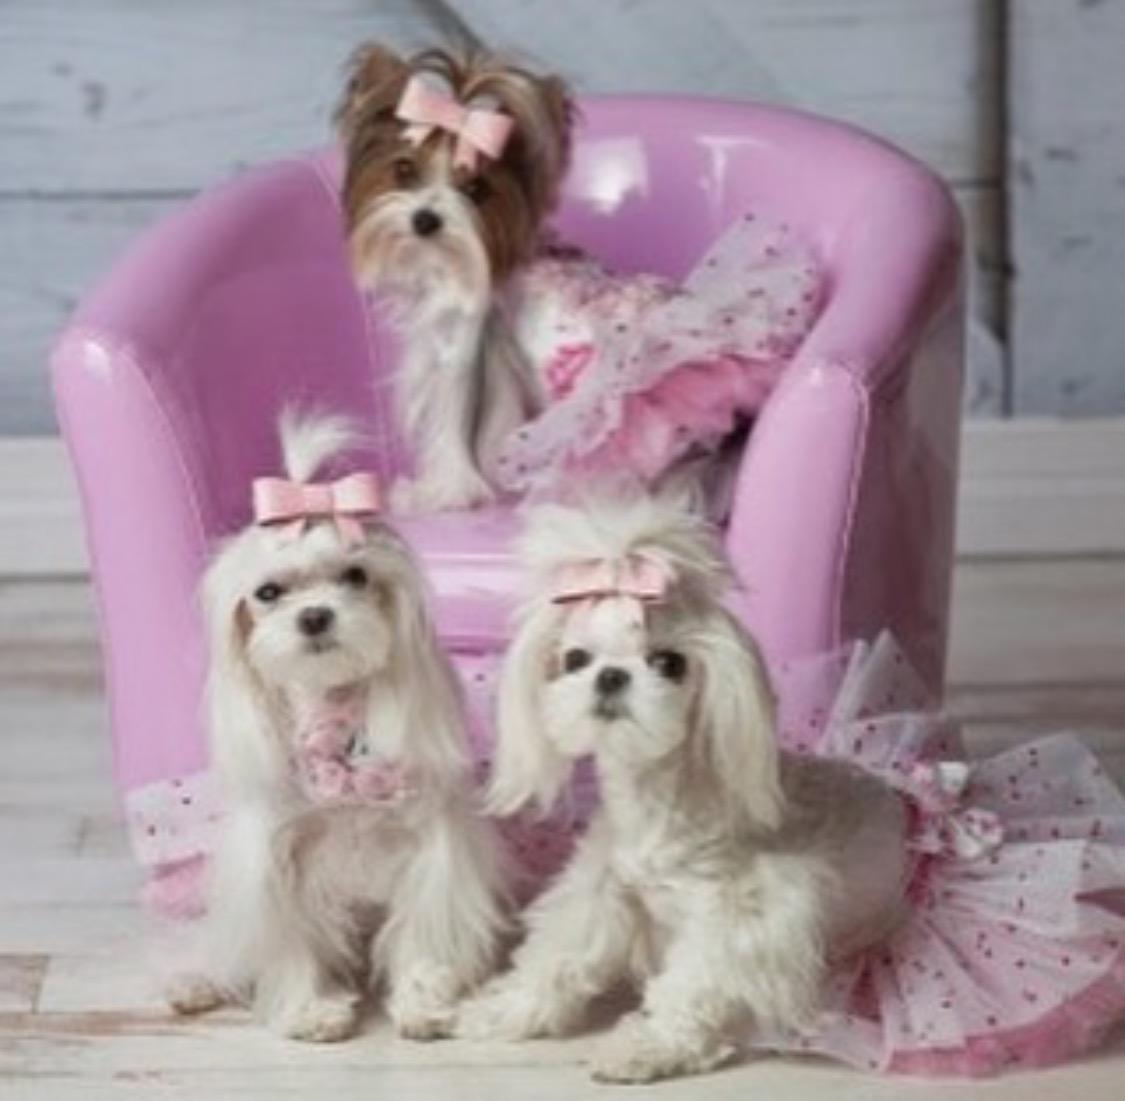 Posh puppies are the latest social status symbol